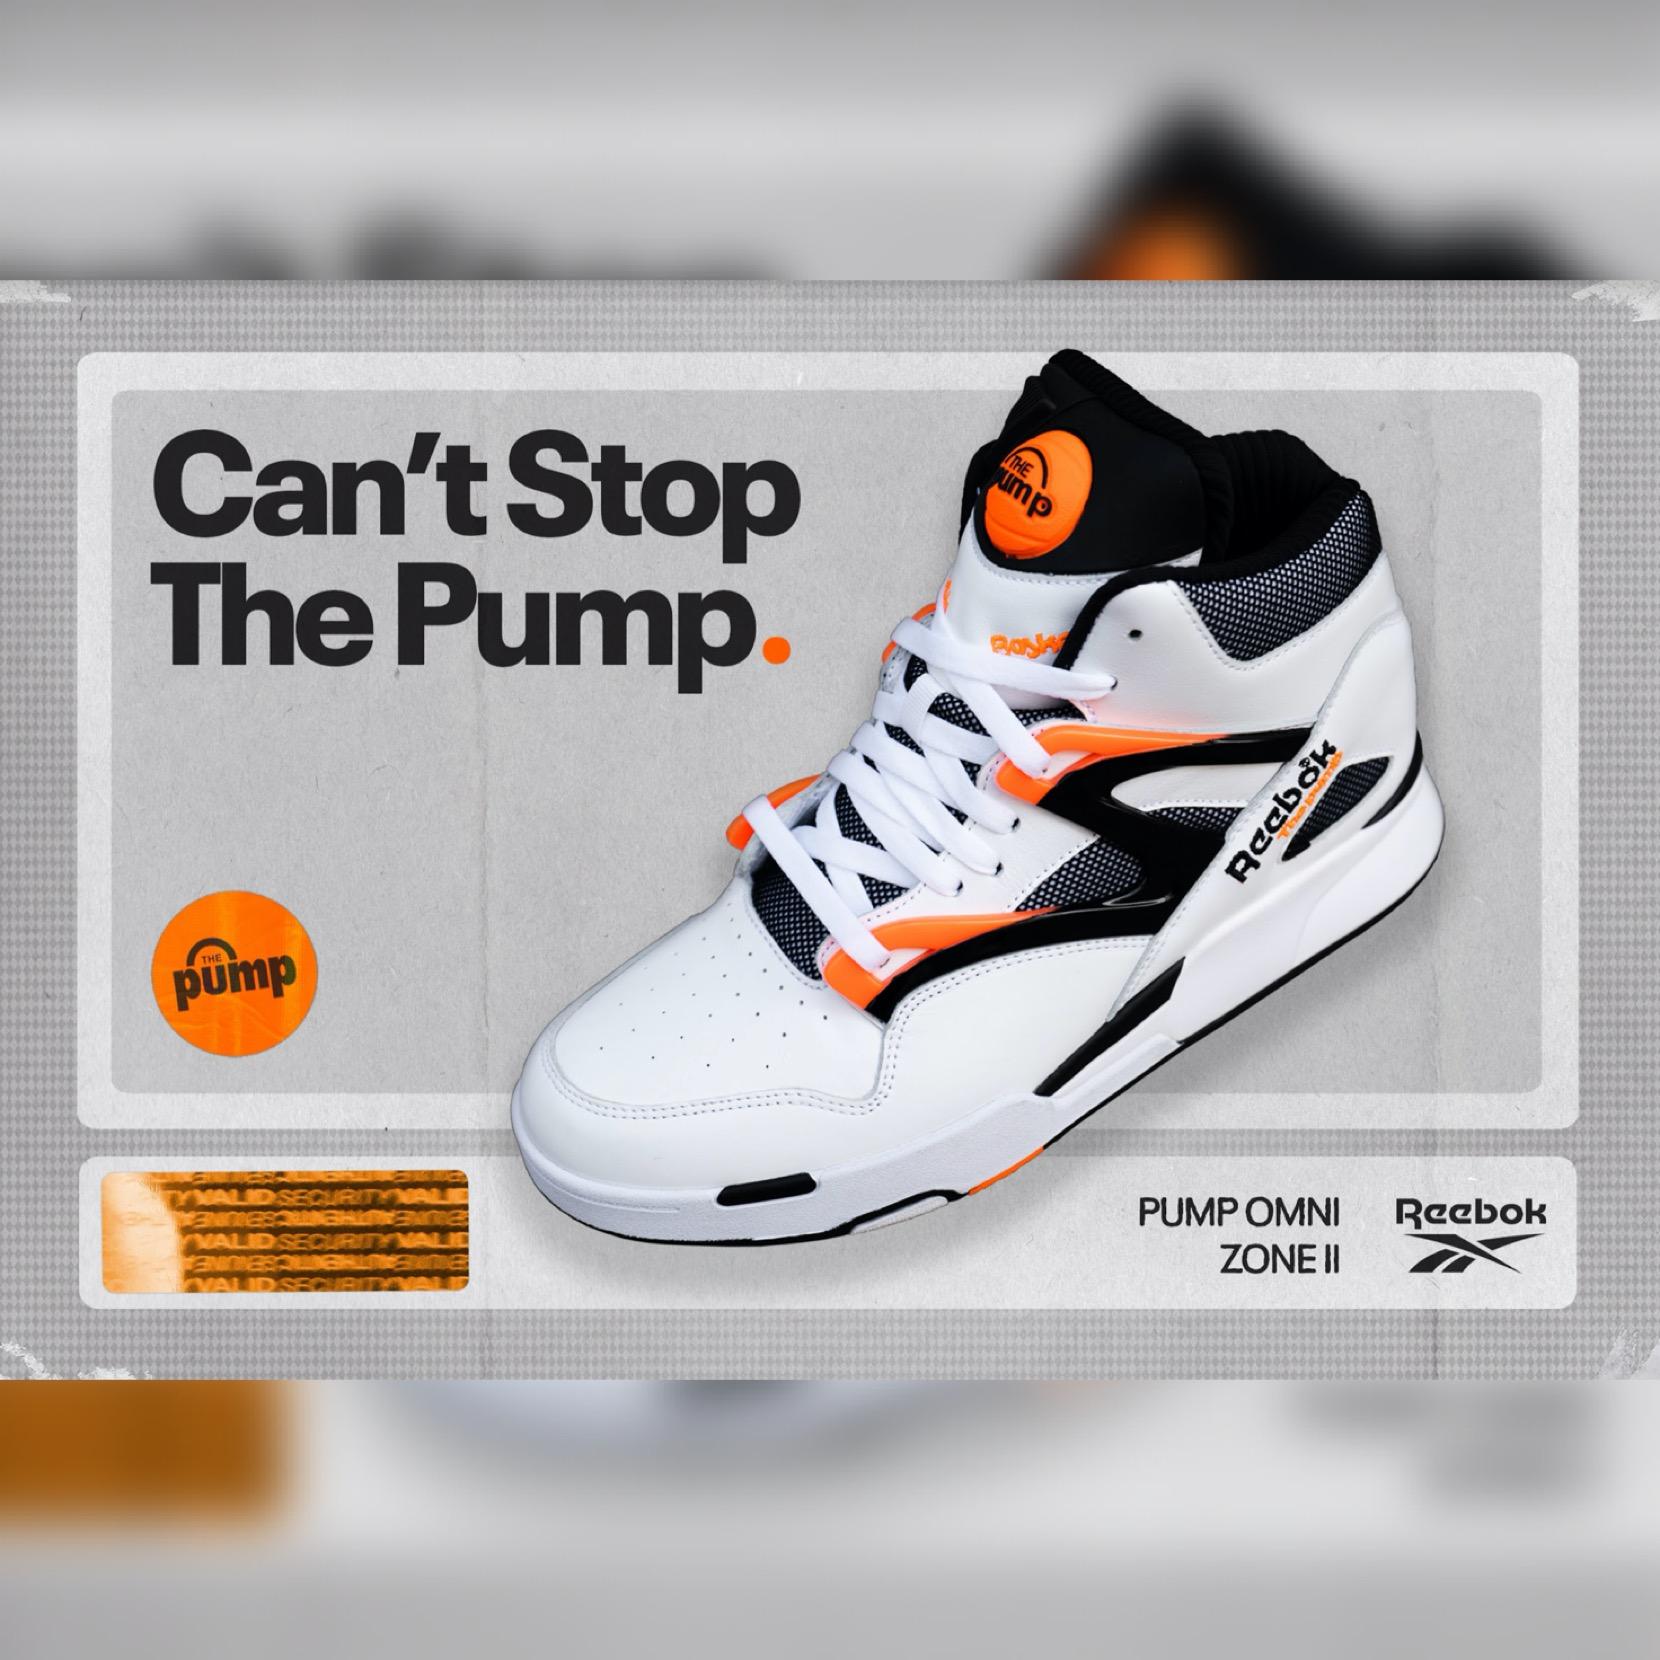 "Reebok's Pump Omni Zone II ""White"" sneakers via Jason Silva at Reebok for use by 360 Magazine"